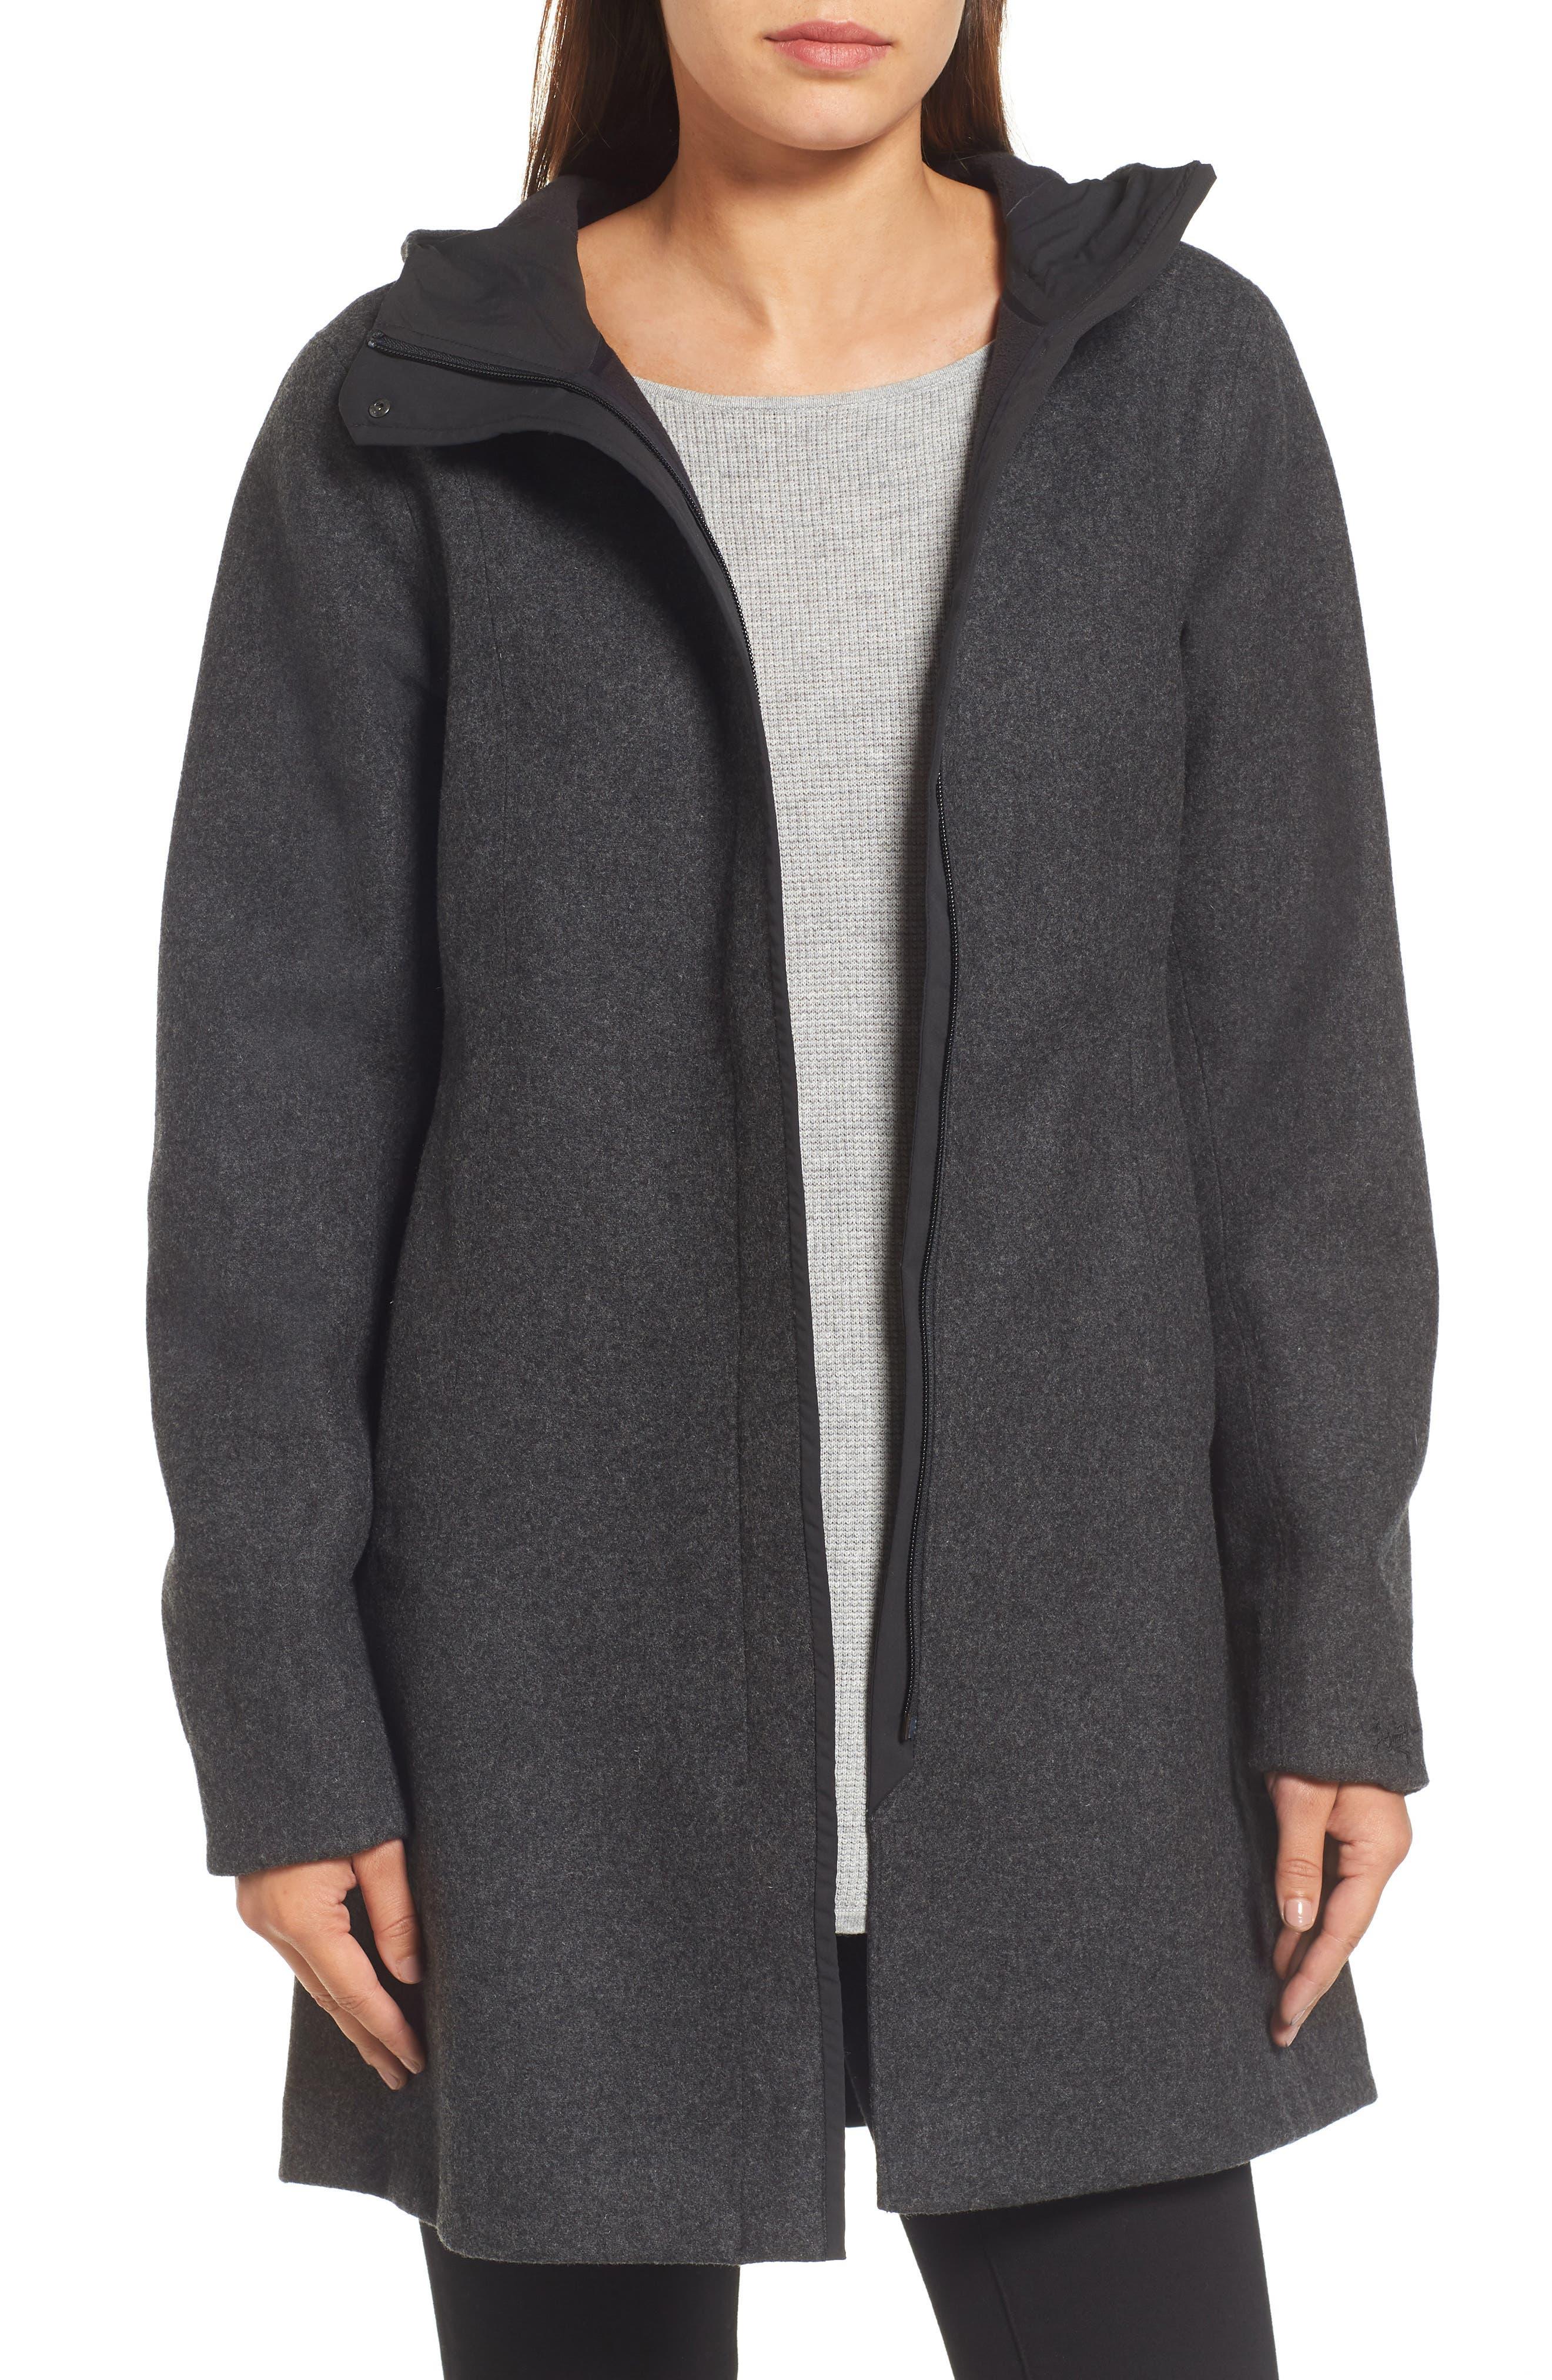 Embra Hooded Walking Coat,                             Main thumbnail 1, color,                             001